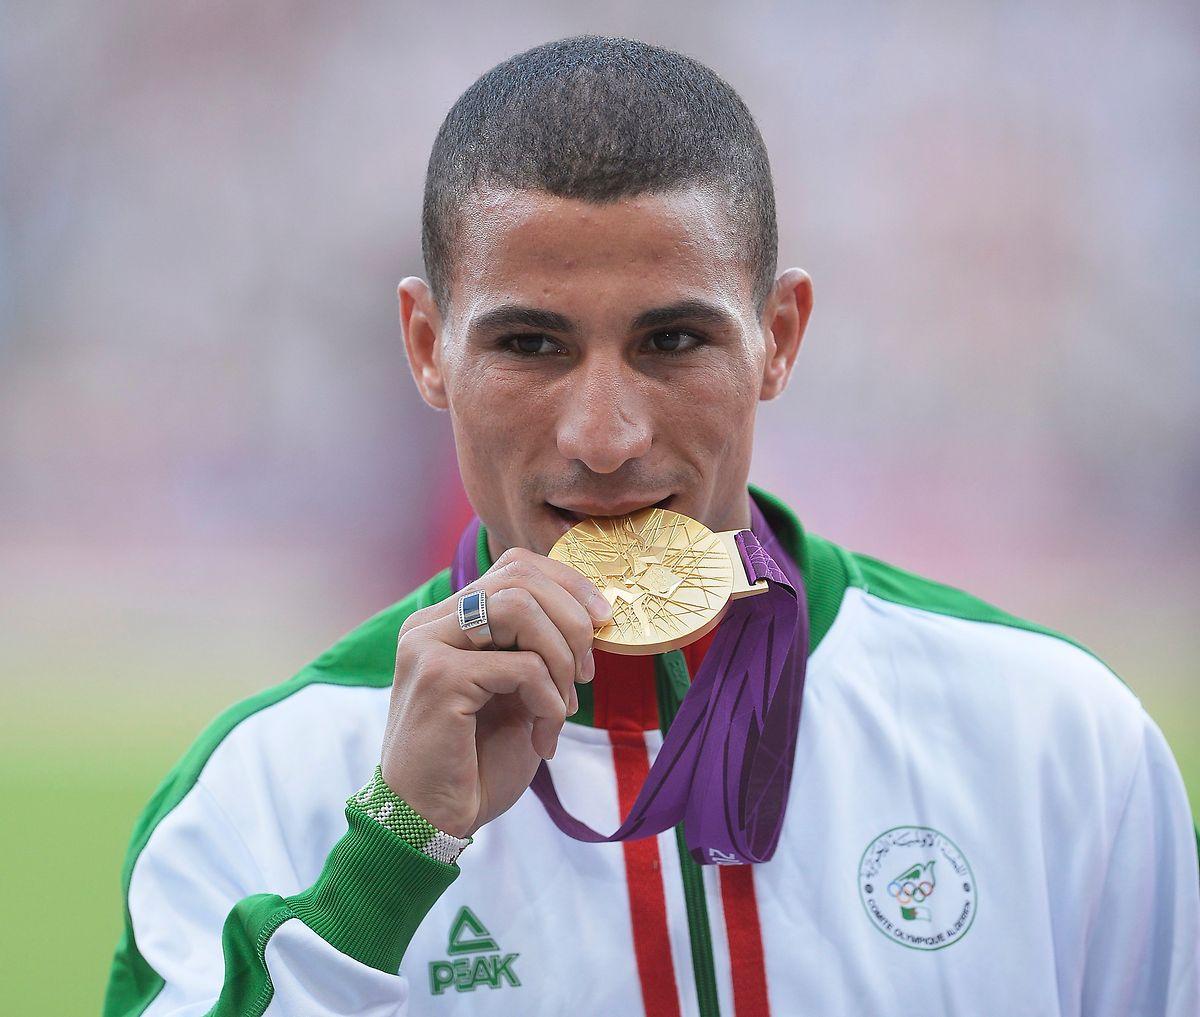 Taoufik Makhloufi holt in Rio die Goldmedaille über 800 m.